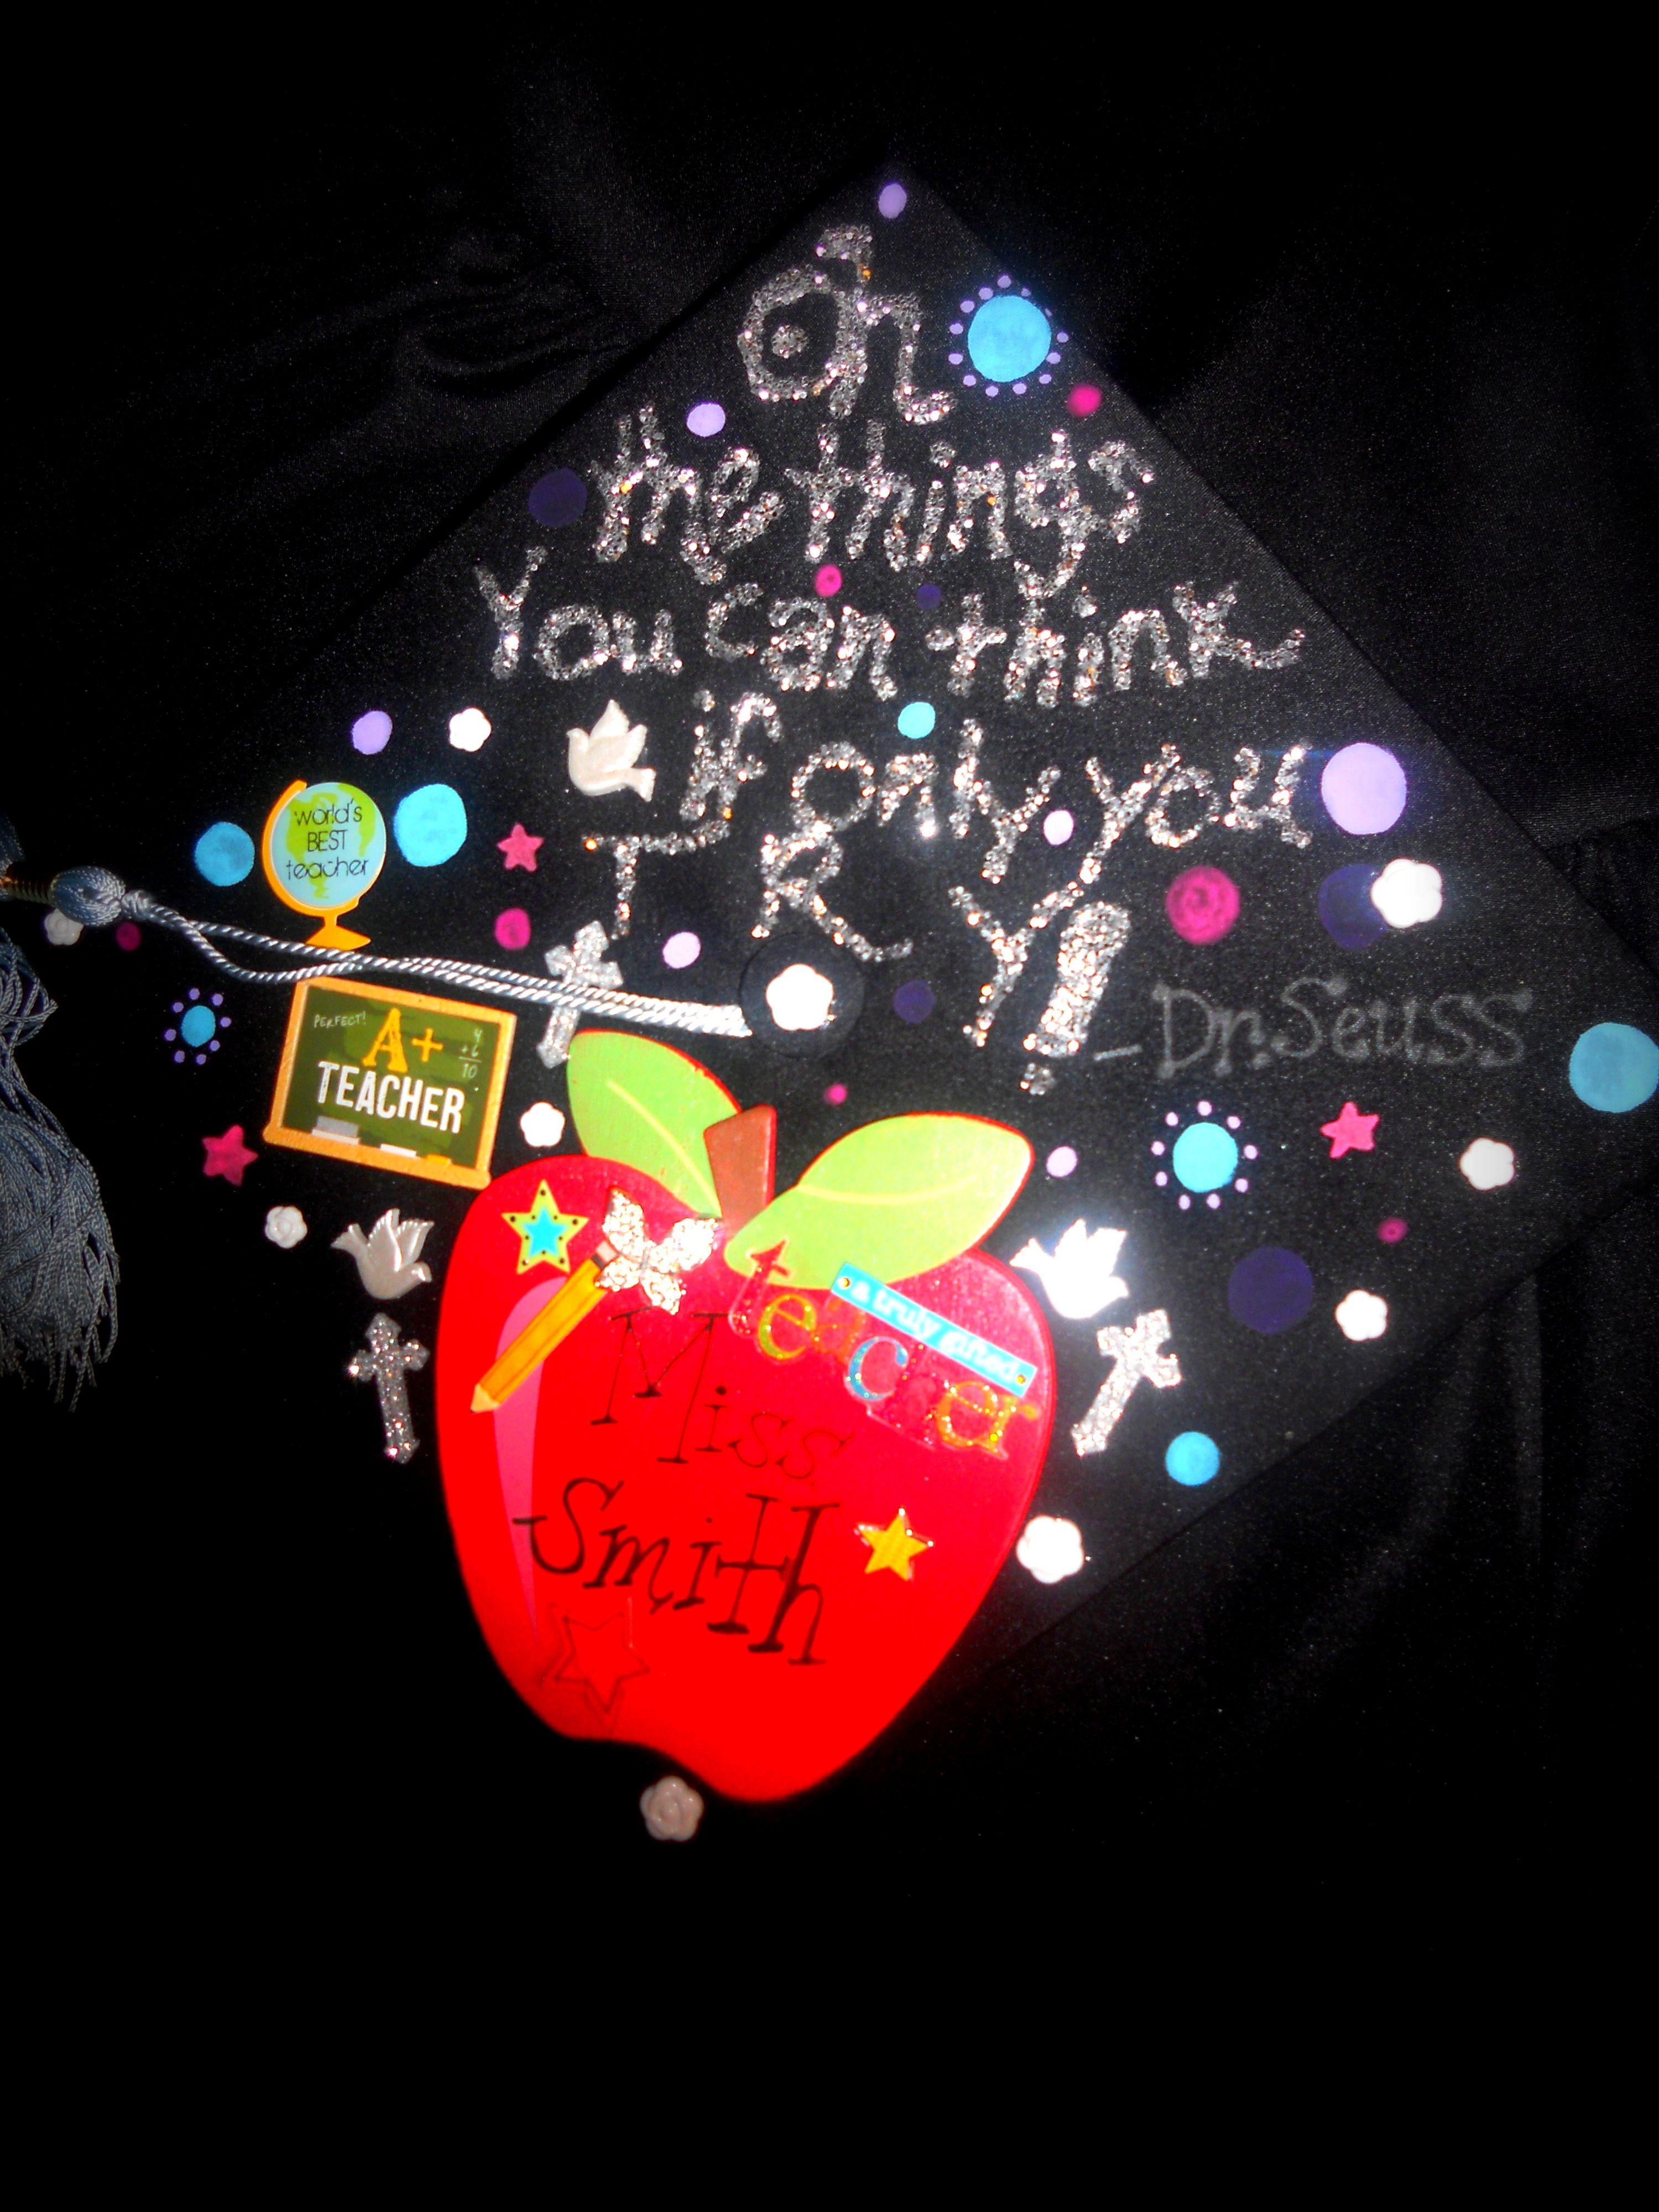 Decorating graduation cap ideas for teachers - Future Teacher Graduation Cap A Little Too Busy For Me But I Love The